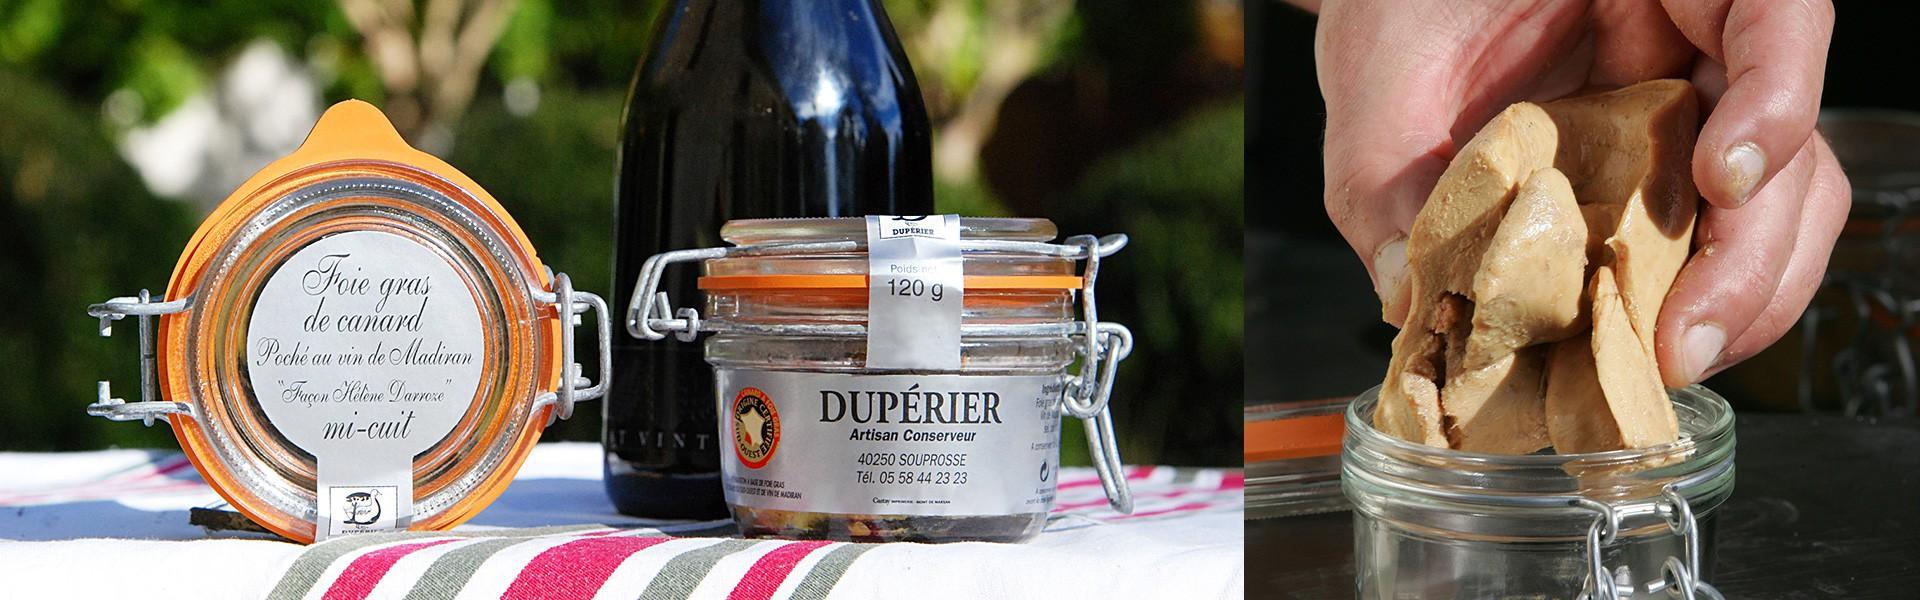 Foie gras de canard mi-cuit poché au vin de Madiran